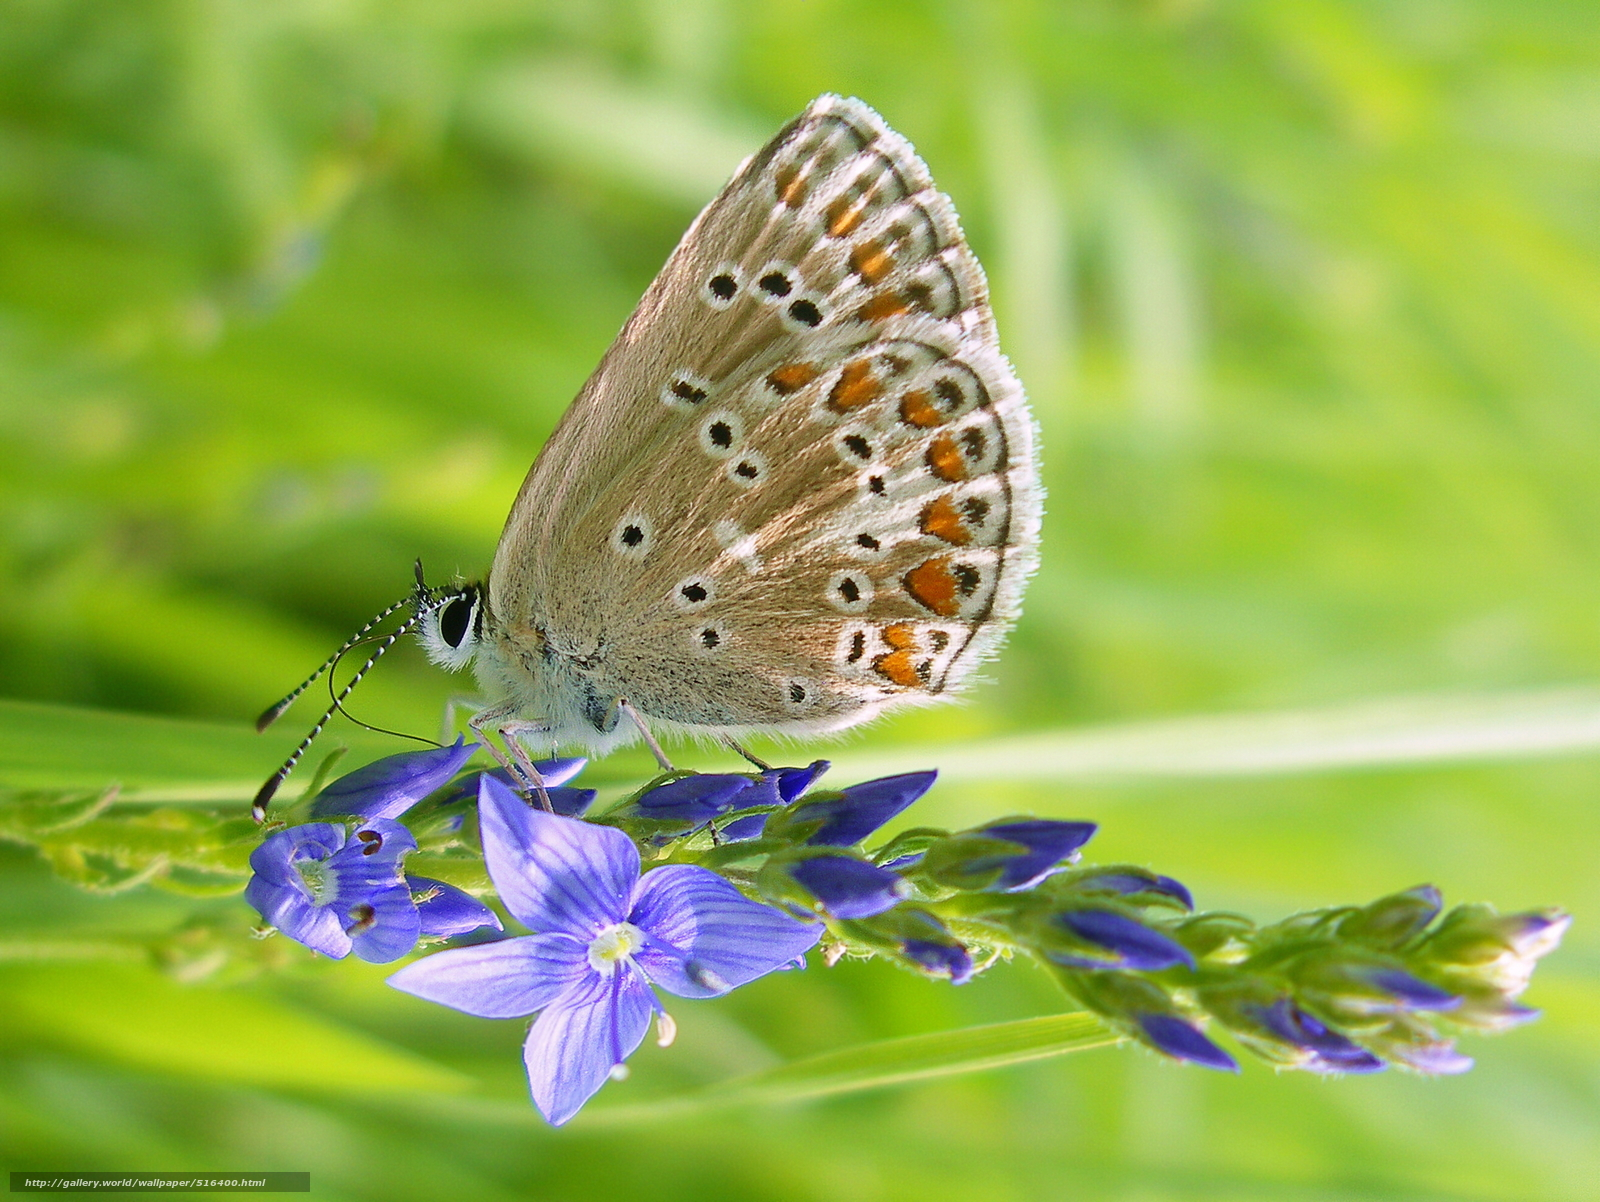 Baixar Wallpaper Borboletas, vero, cobre-borboleta, natureza Papis de ...: http://pt.gde-fon.com/download/Borboletas_vero_cobre/516400/4000x3005